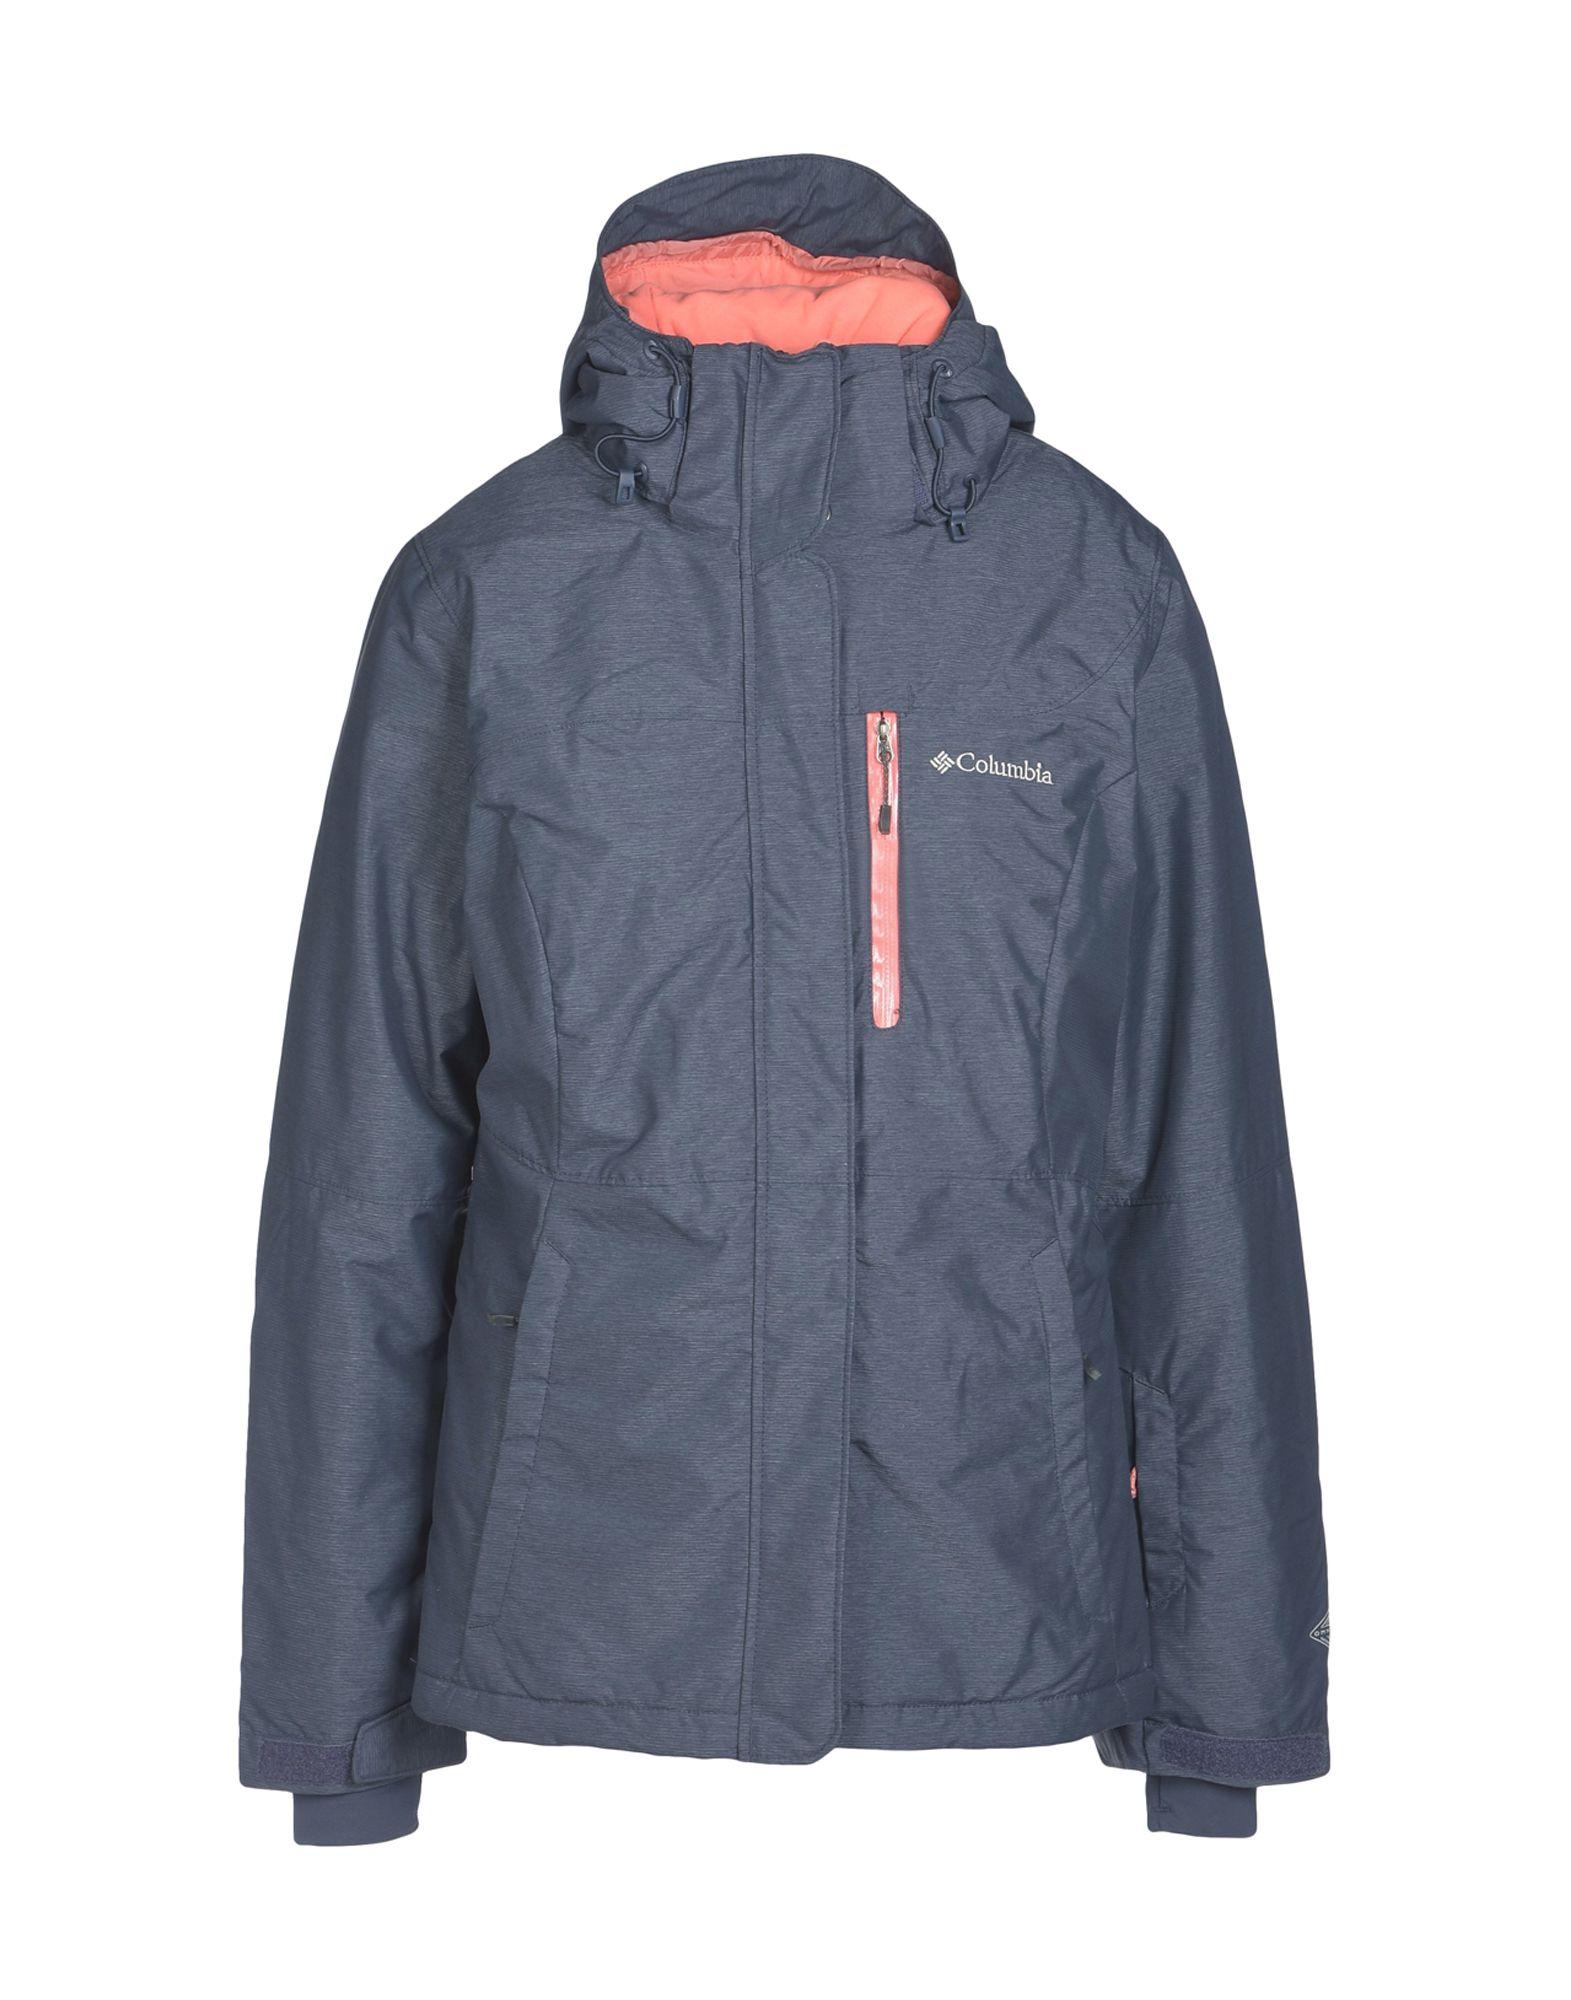 COLUMBIA Damen Jacke Farbe Dunkelblau Größe 5